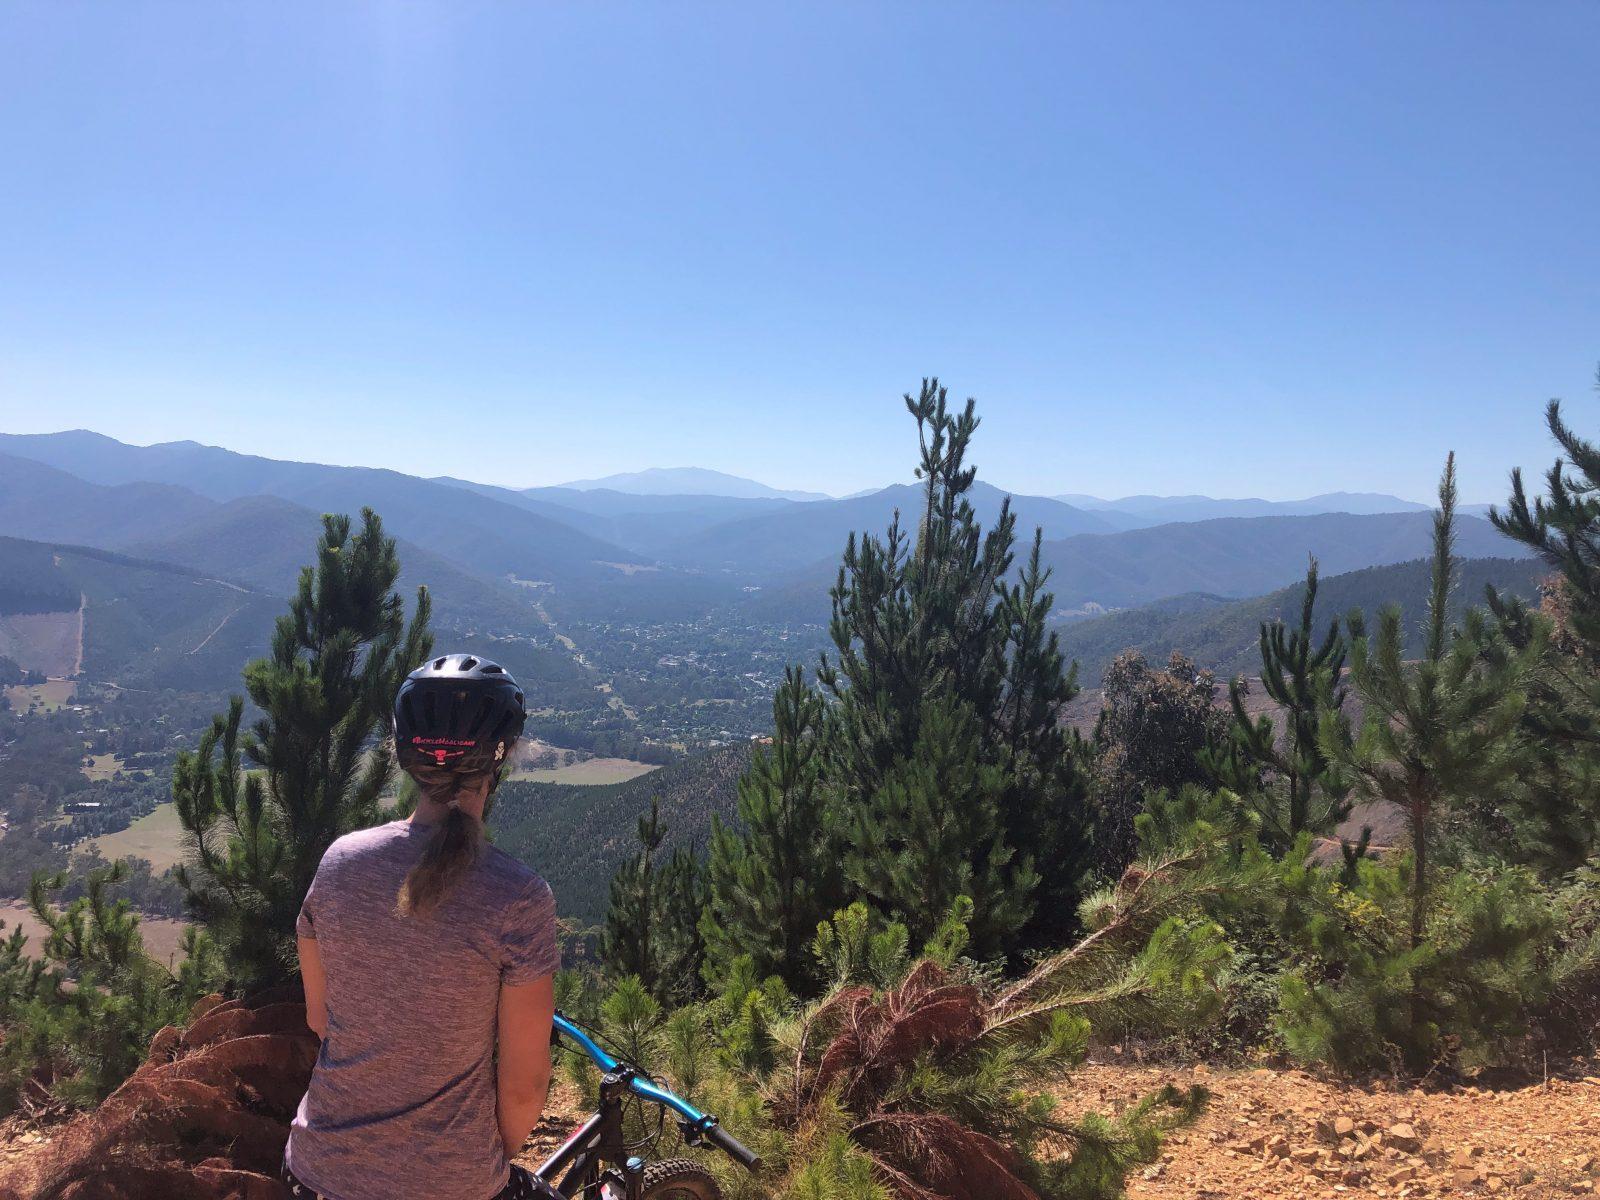 Bright MTB Mountain Biking